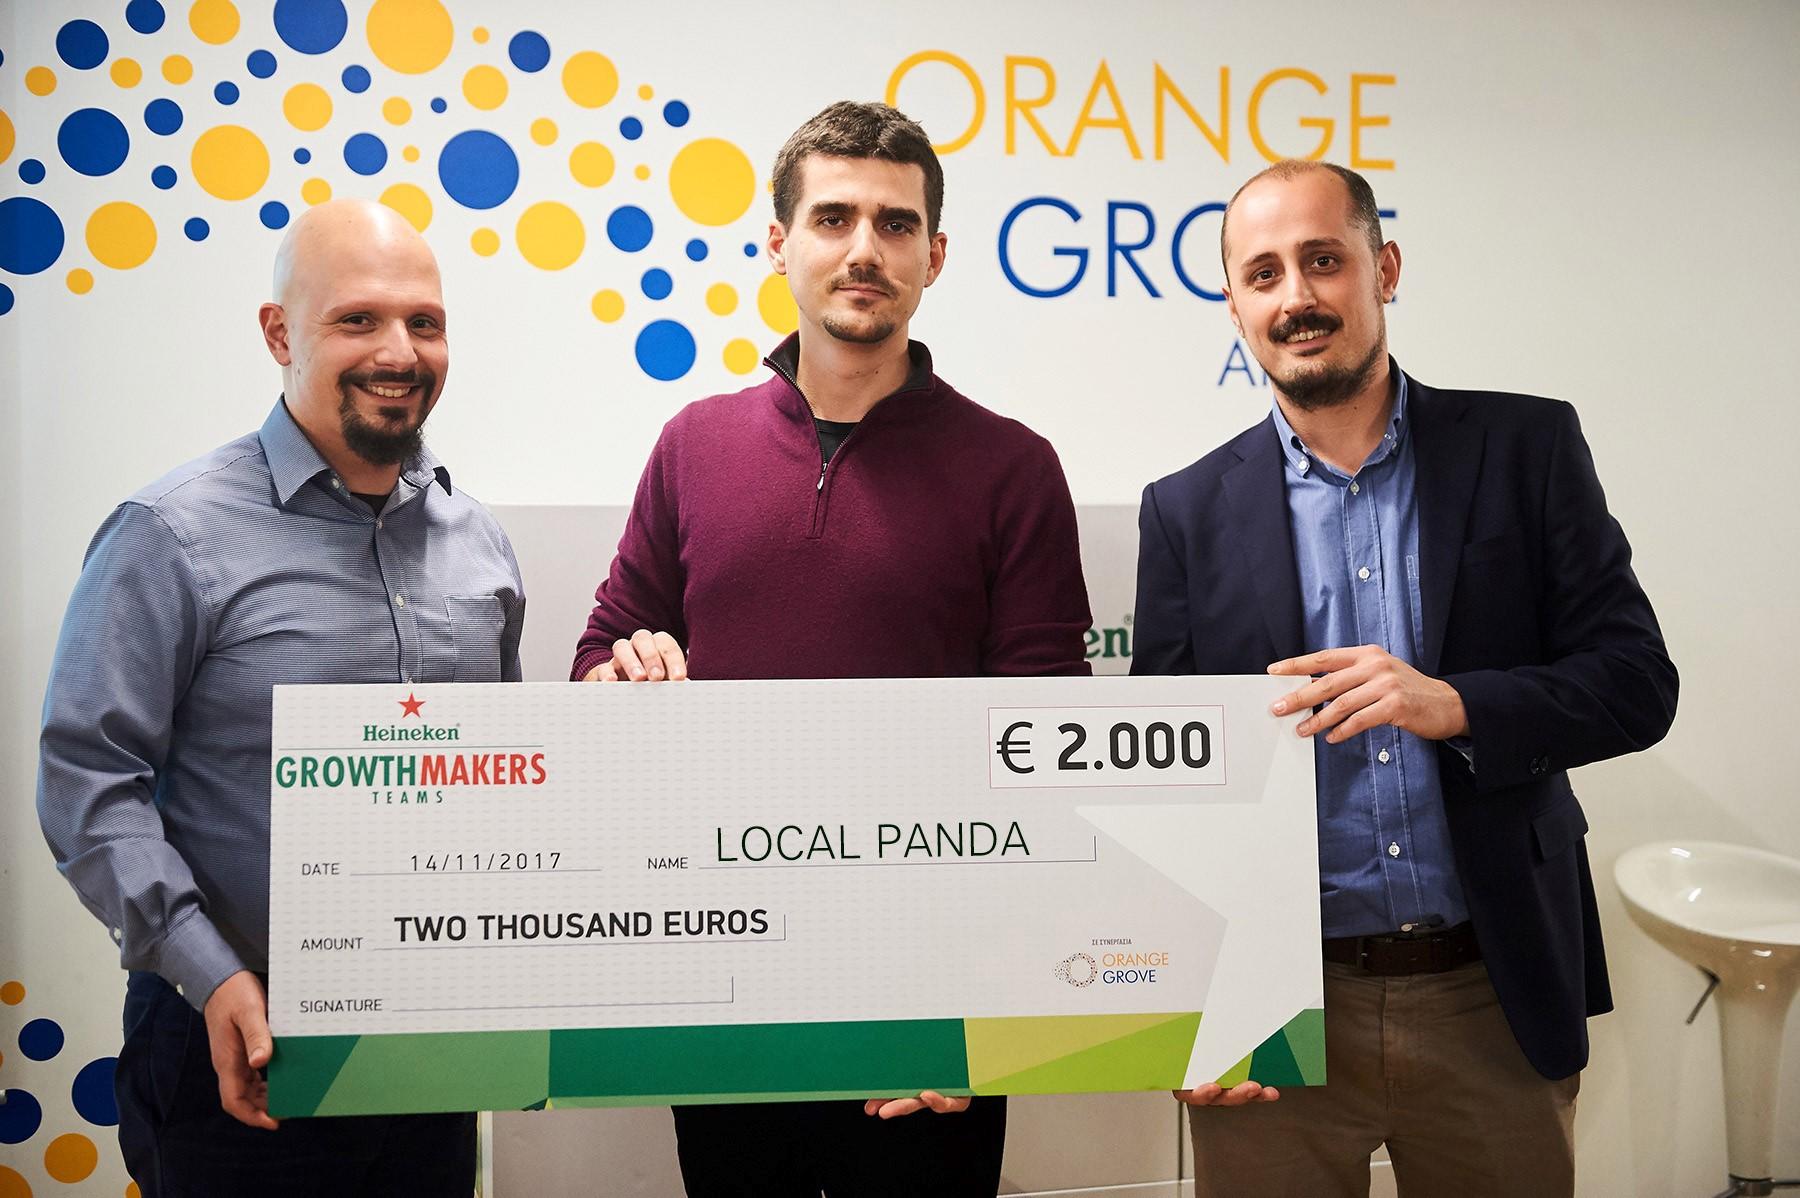 7.Local Panda: νικήτρια ομάδα του επιχειρηματικού διαγωνισμού Heineken Growth Makers.